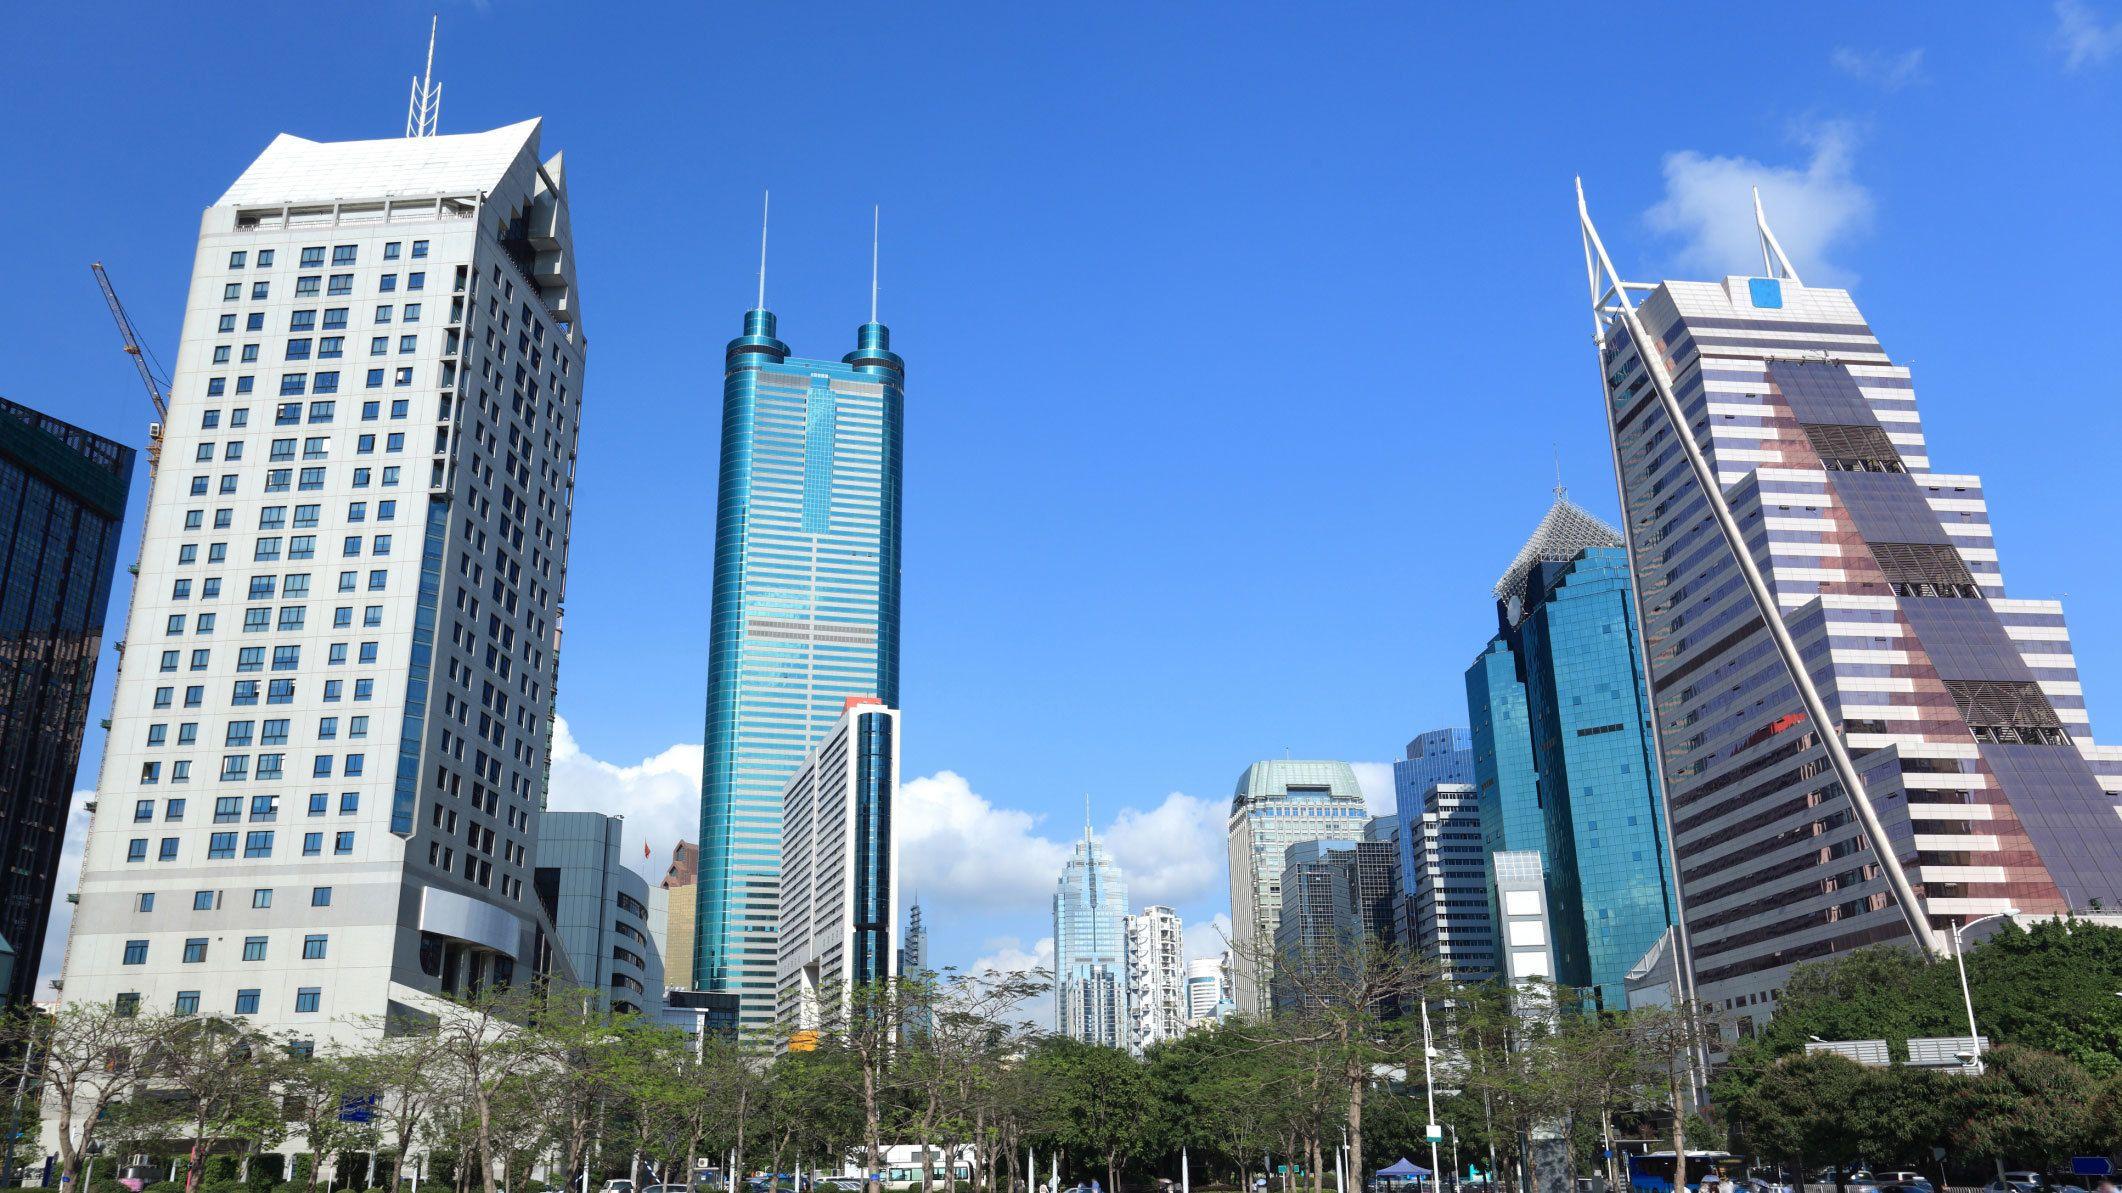 Clear day exploring the city of Hong Kong